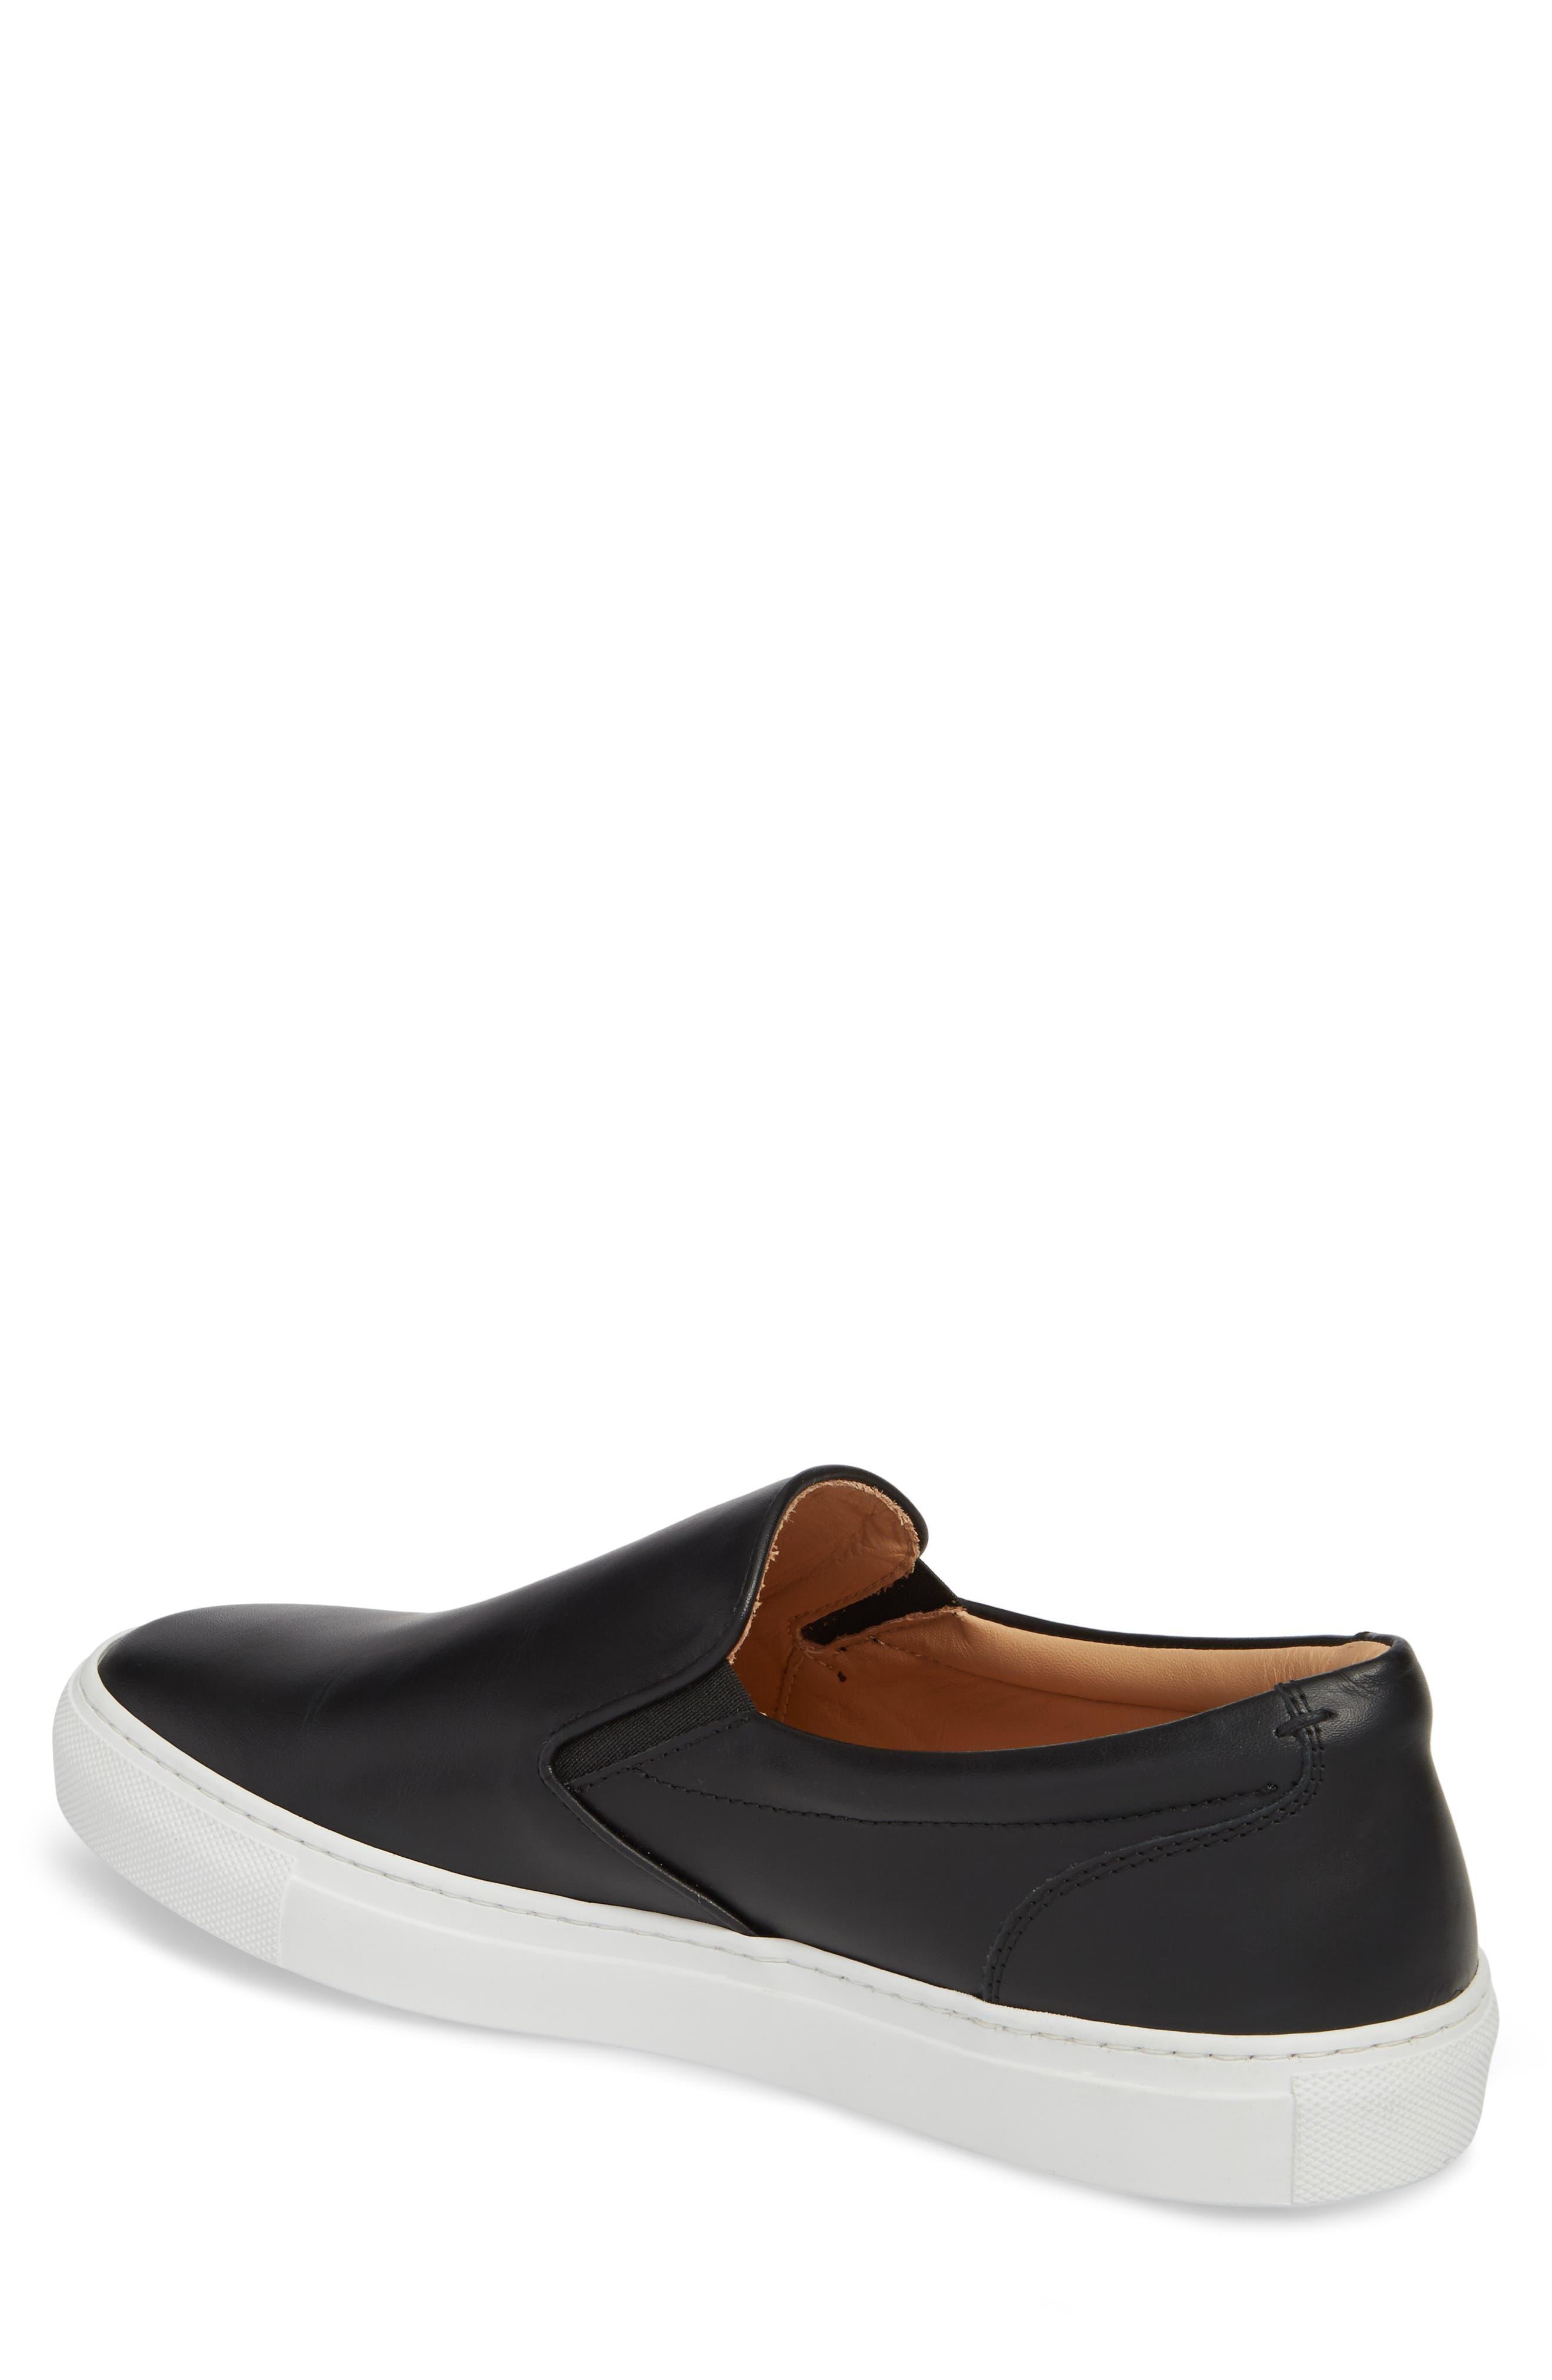 Wooster Slip-On Sneaker,                             Alternate thumbnail 2, color,                             Black Leather